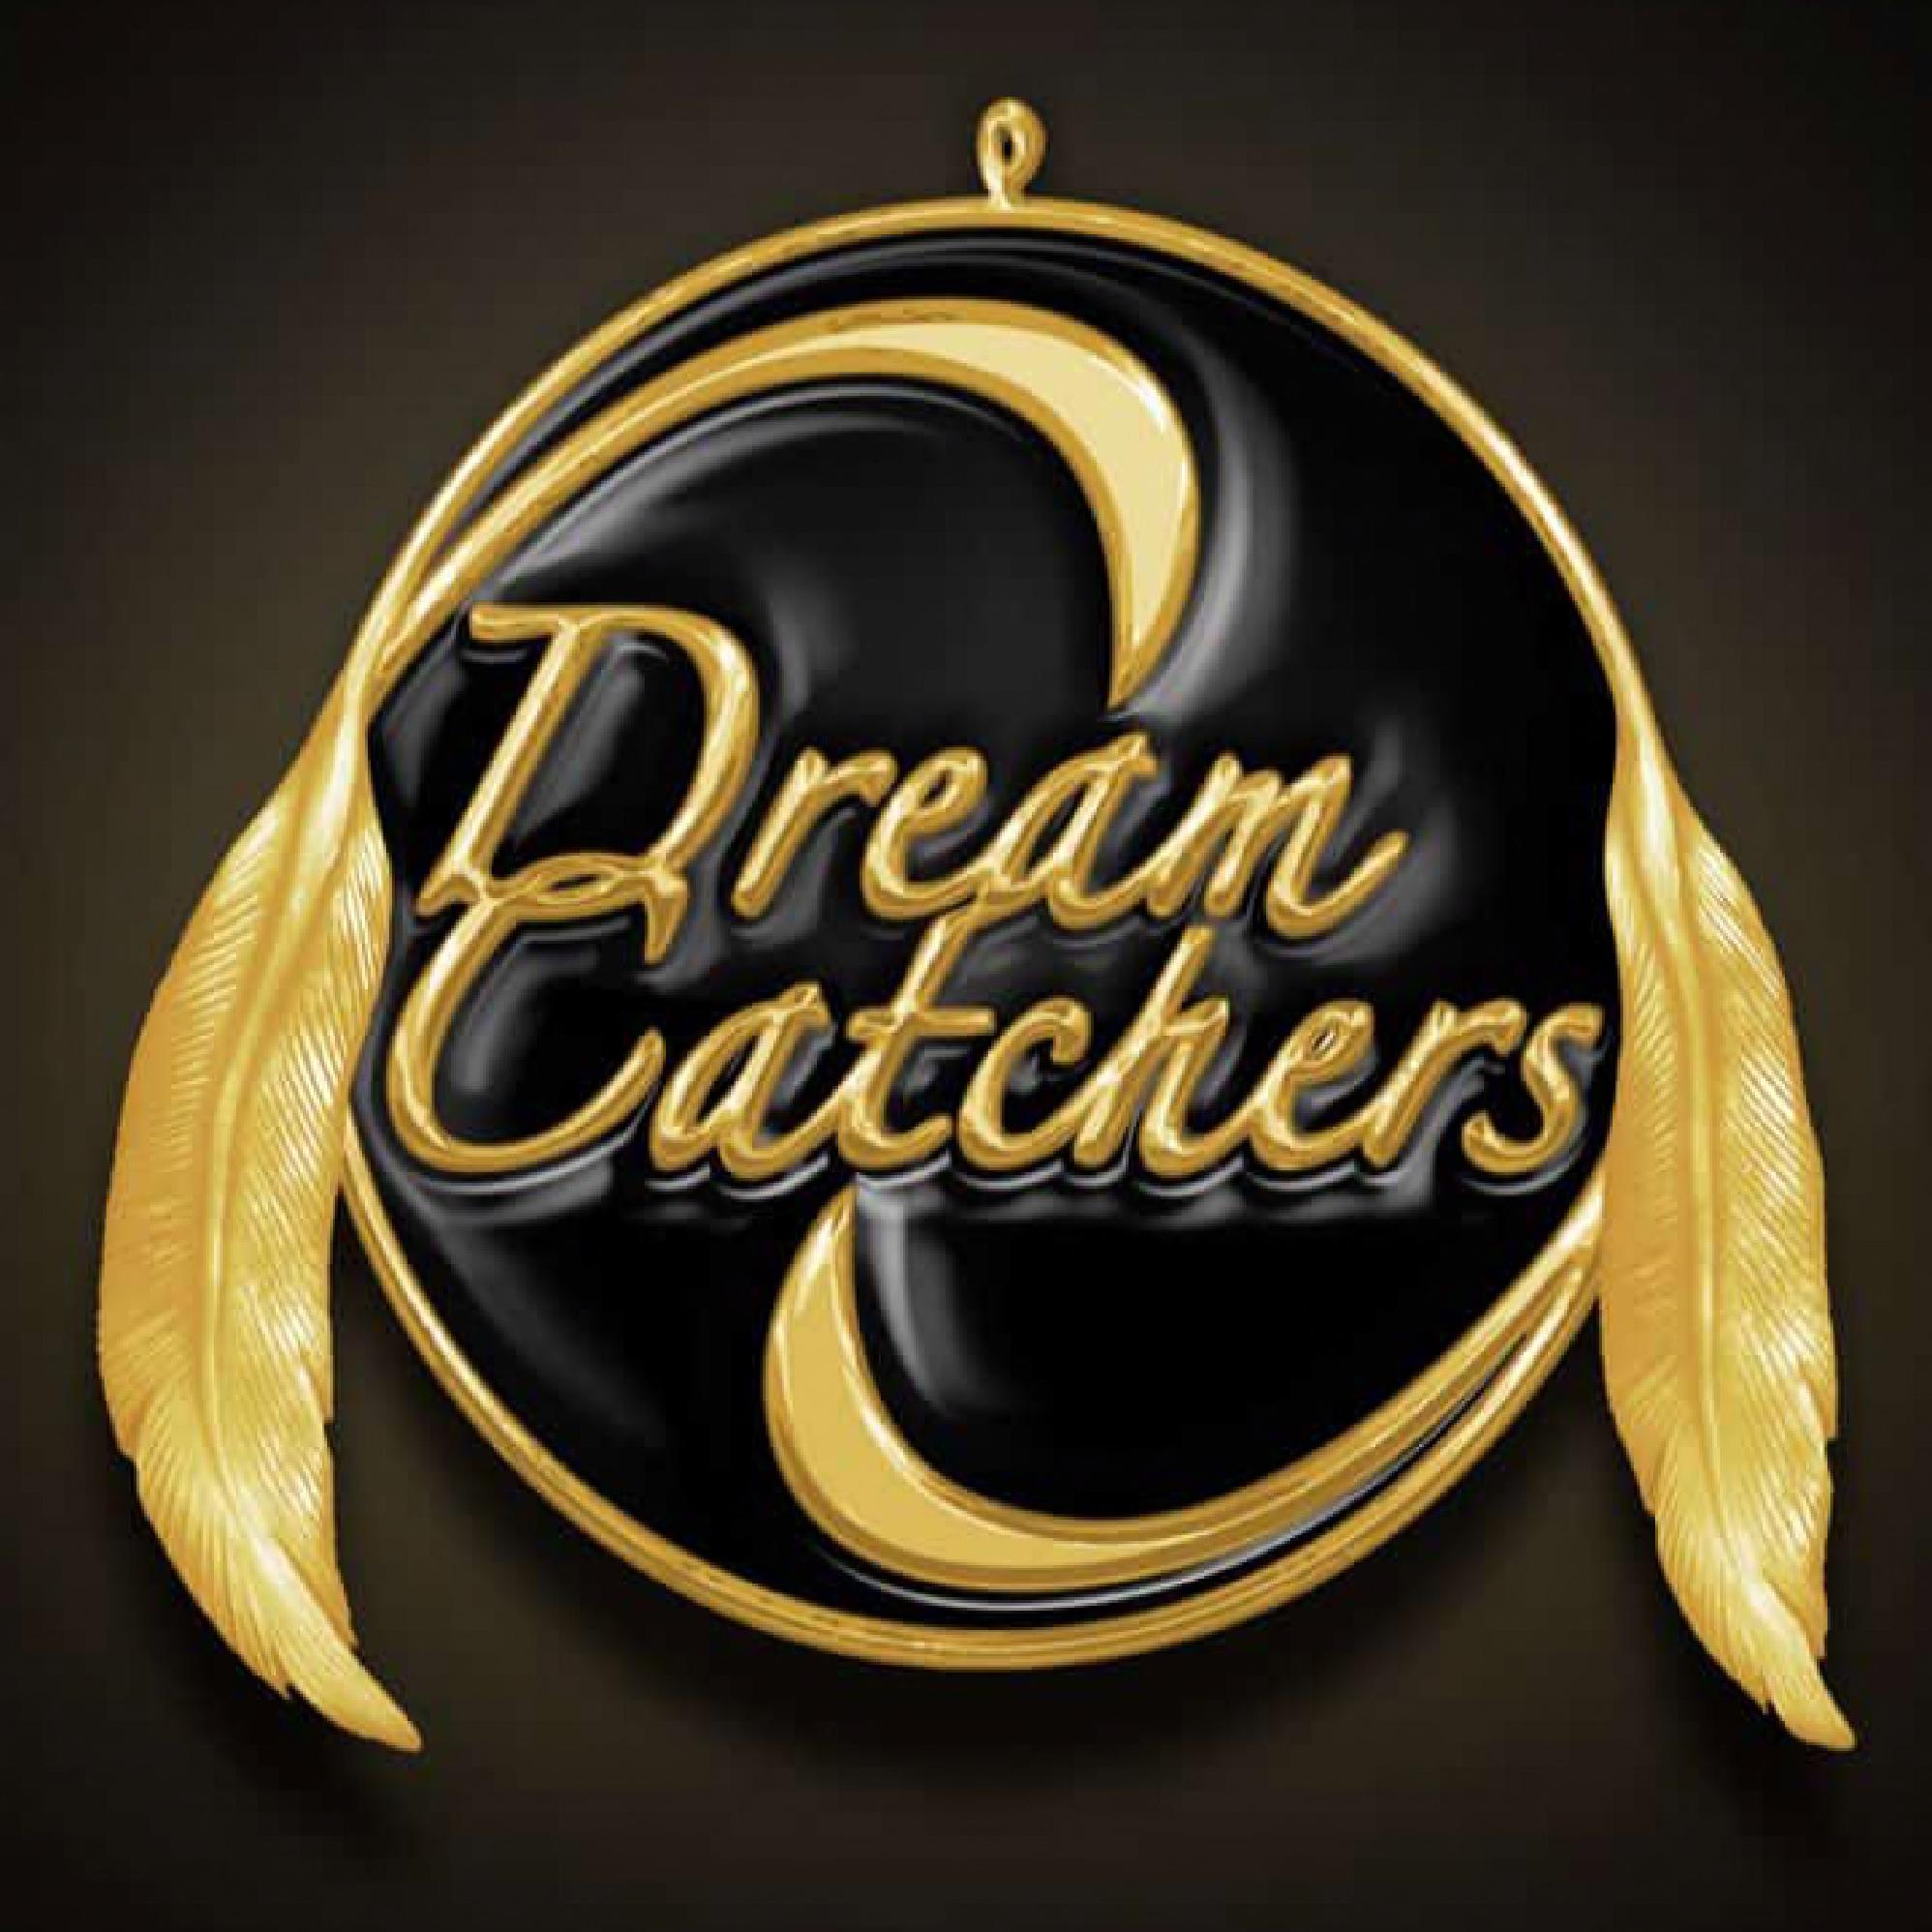 DreamCatchers Variety Club